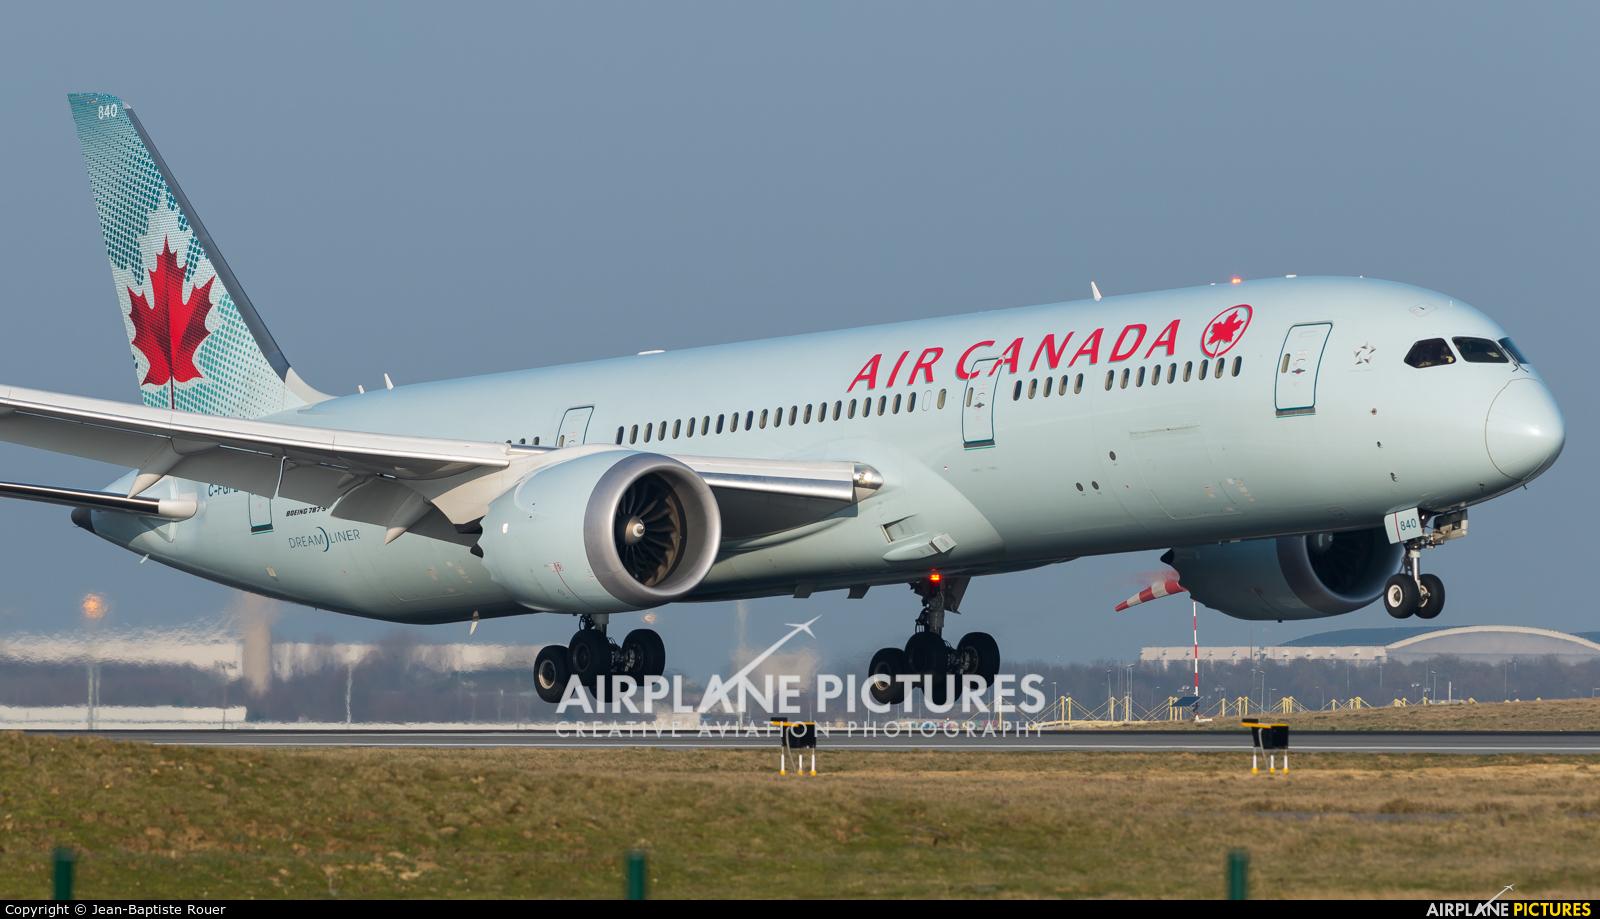 Air Canada C-FGFZ aircraft at Paris - Charles de Gaulle